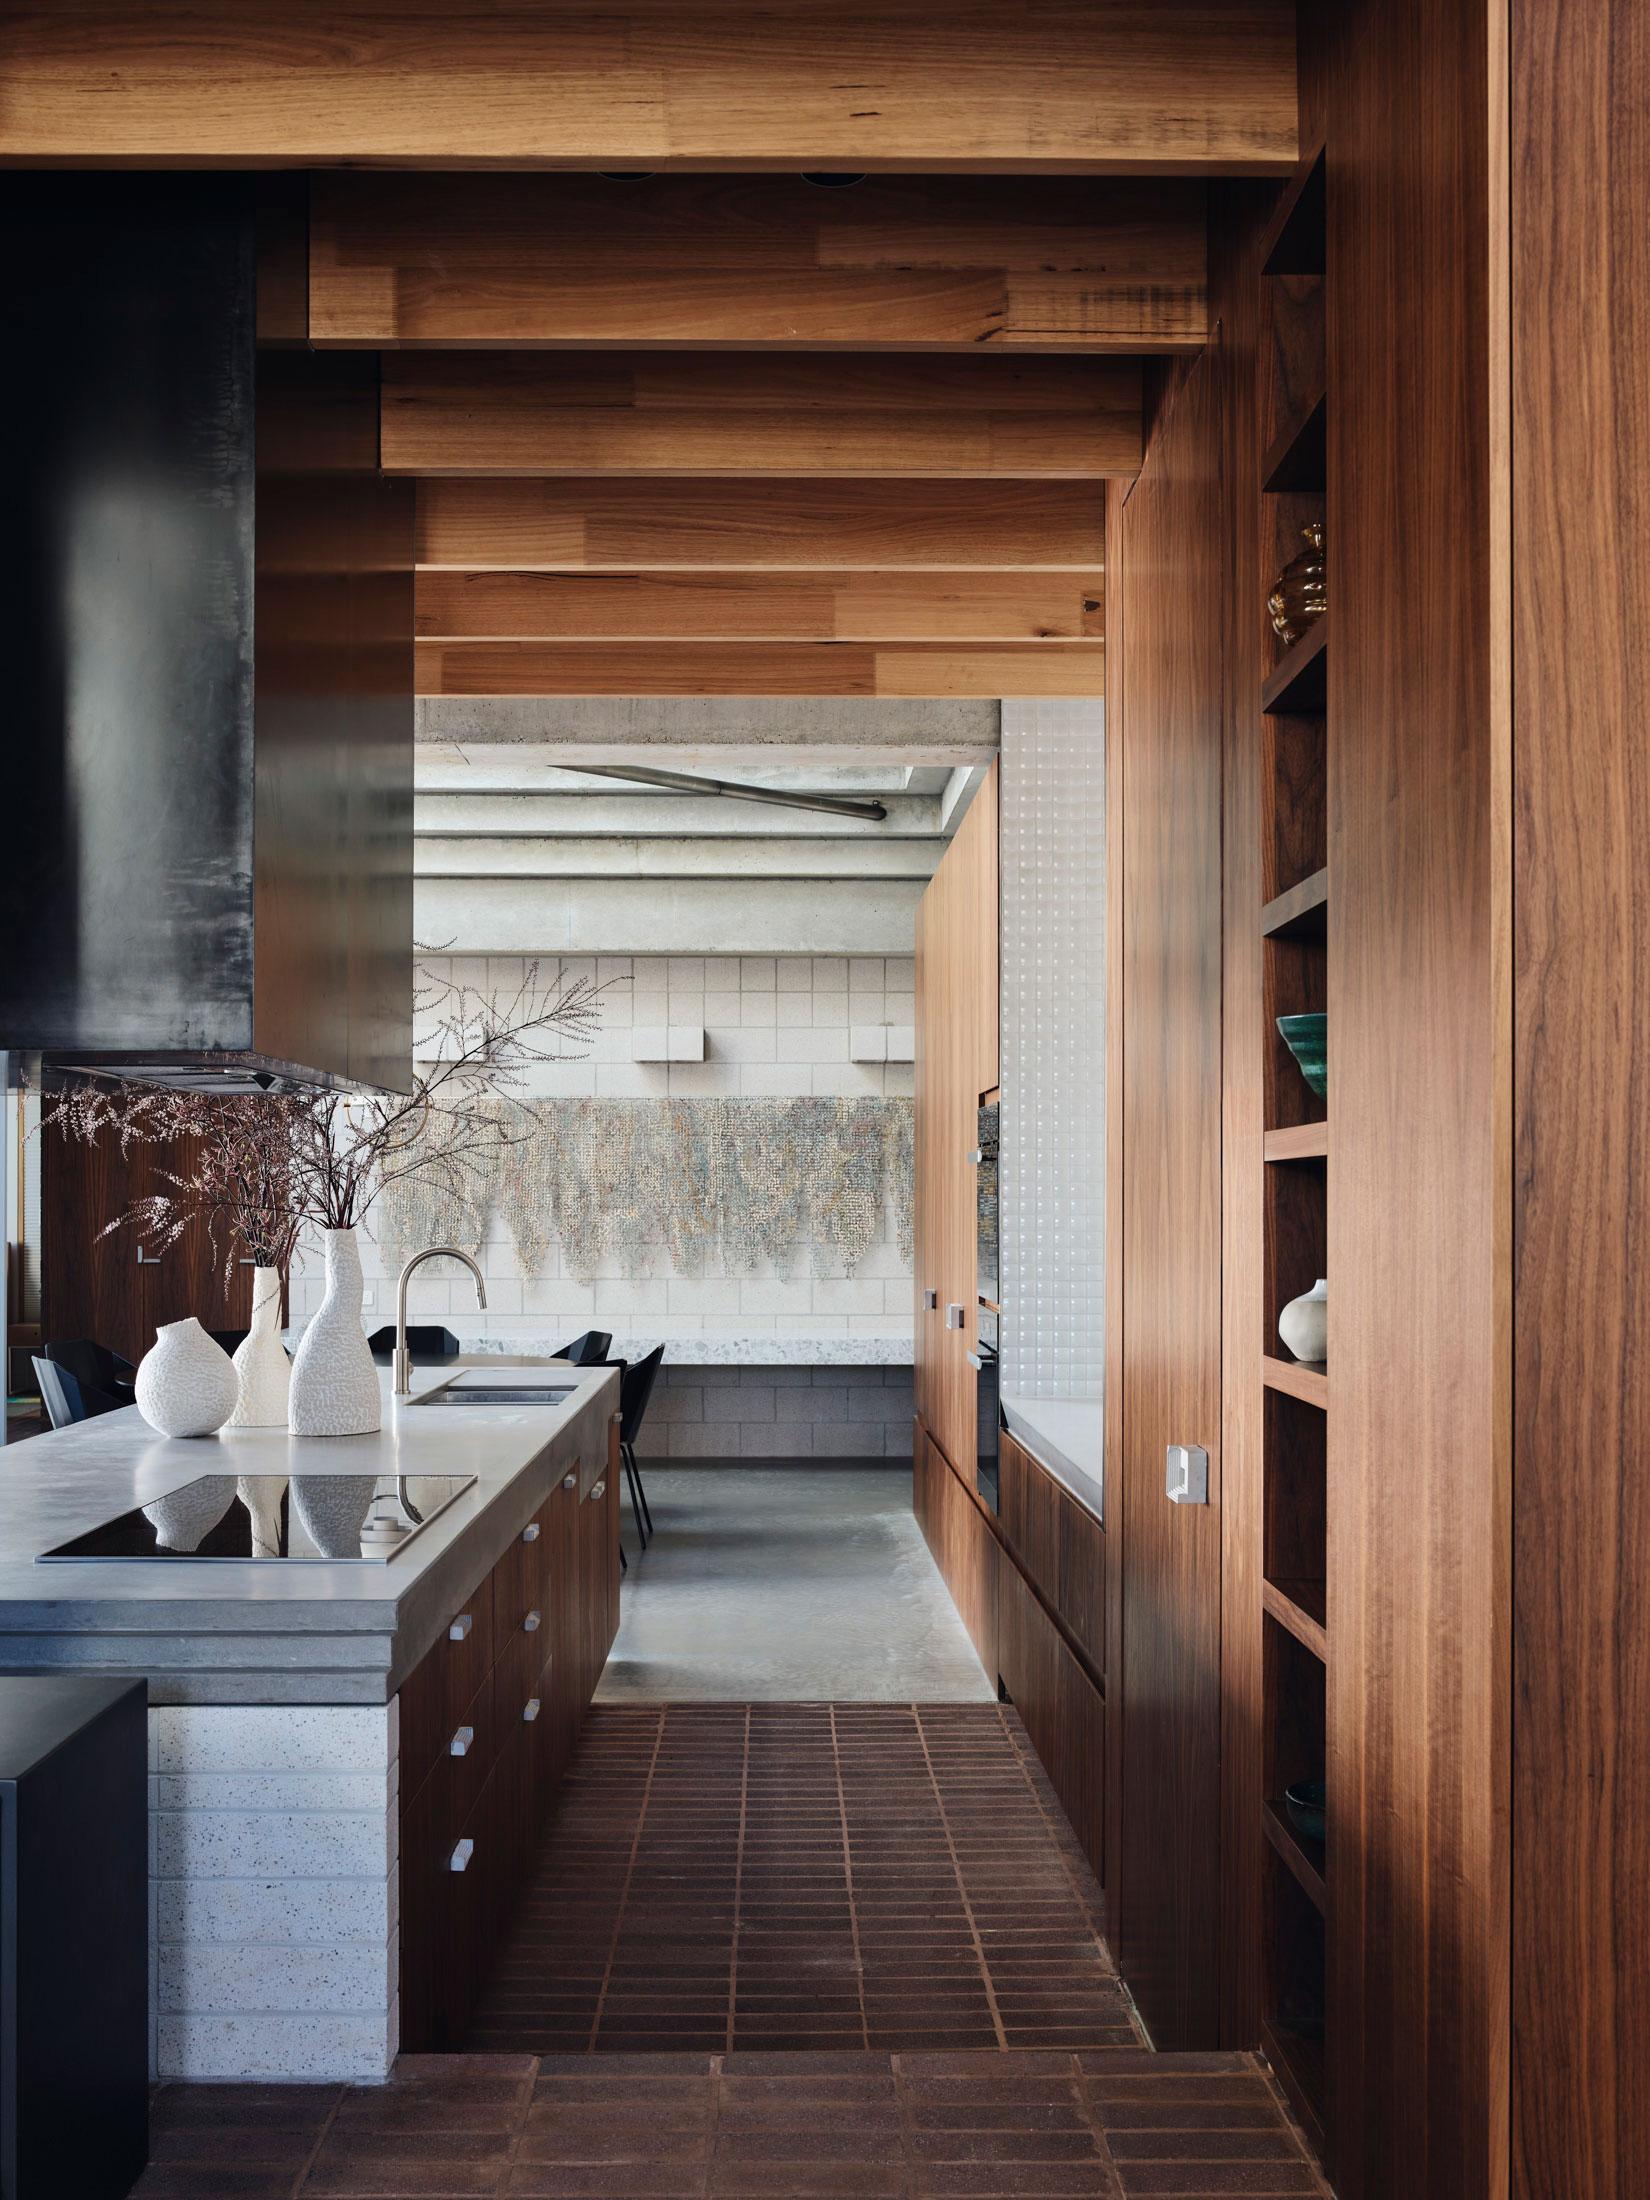 Architects Eat Bellows Beach House Flinders Masonry Architecture Photo Derek Swalwell Yellowtrace 30